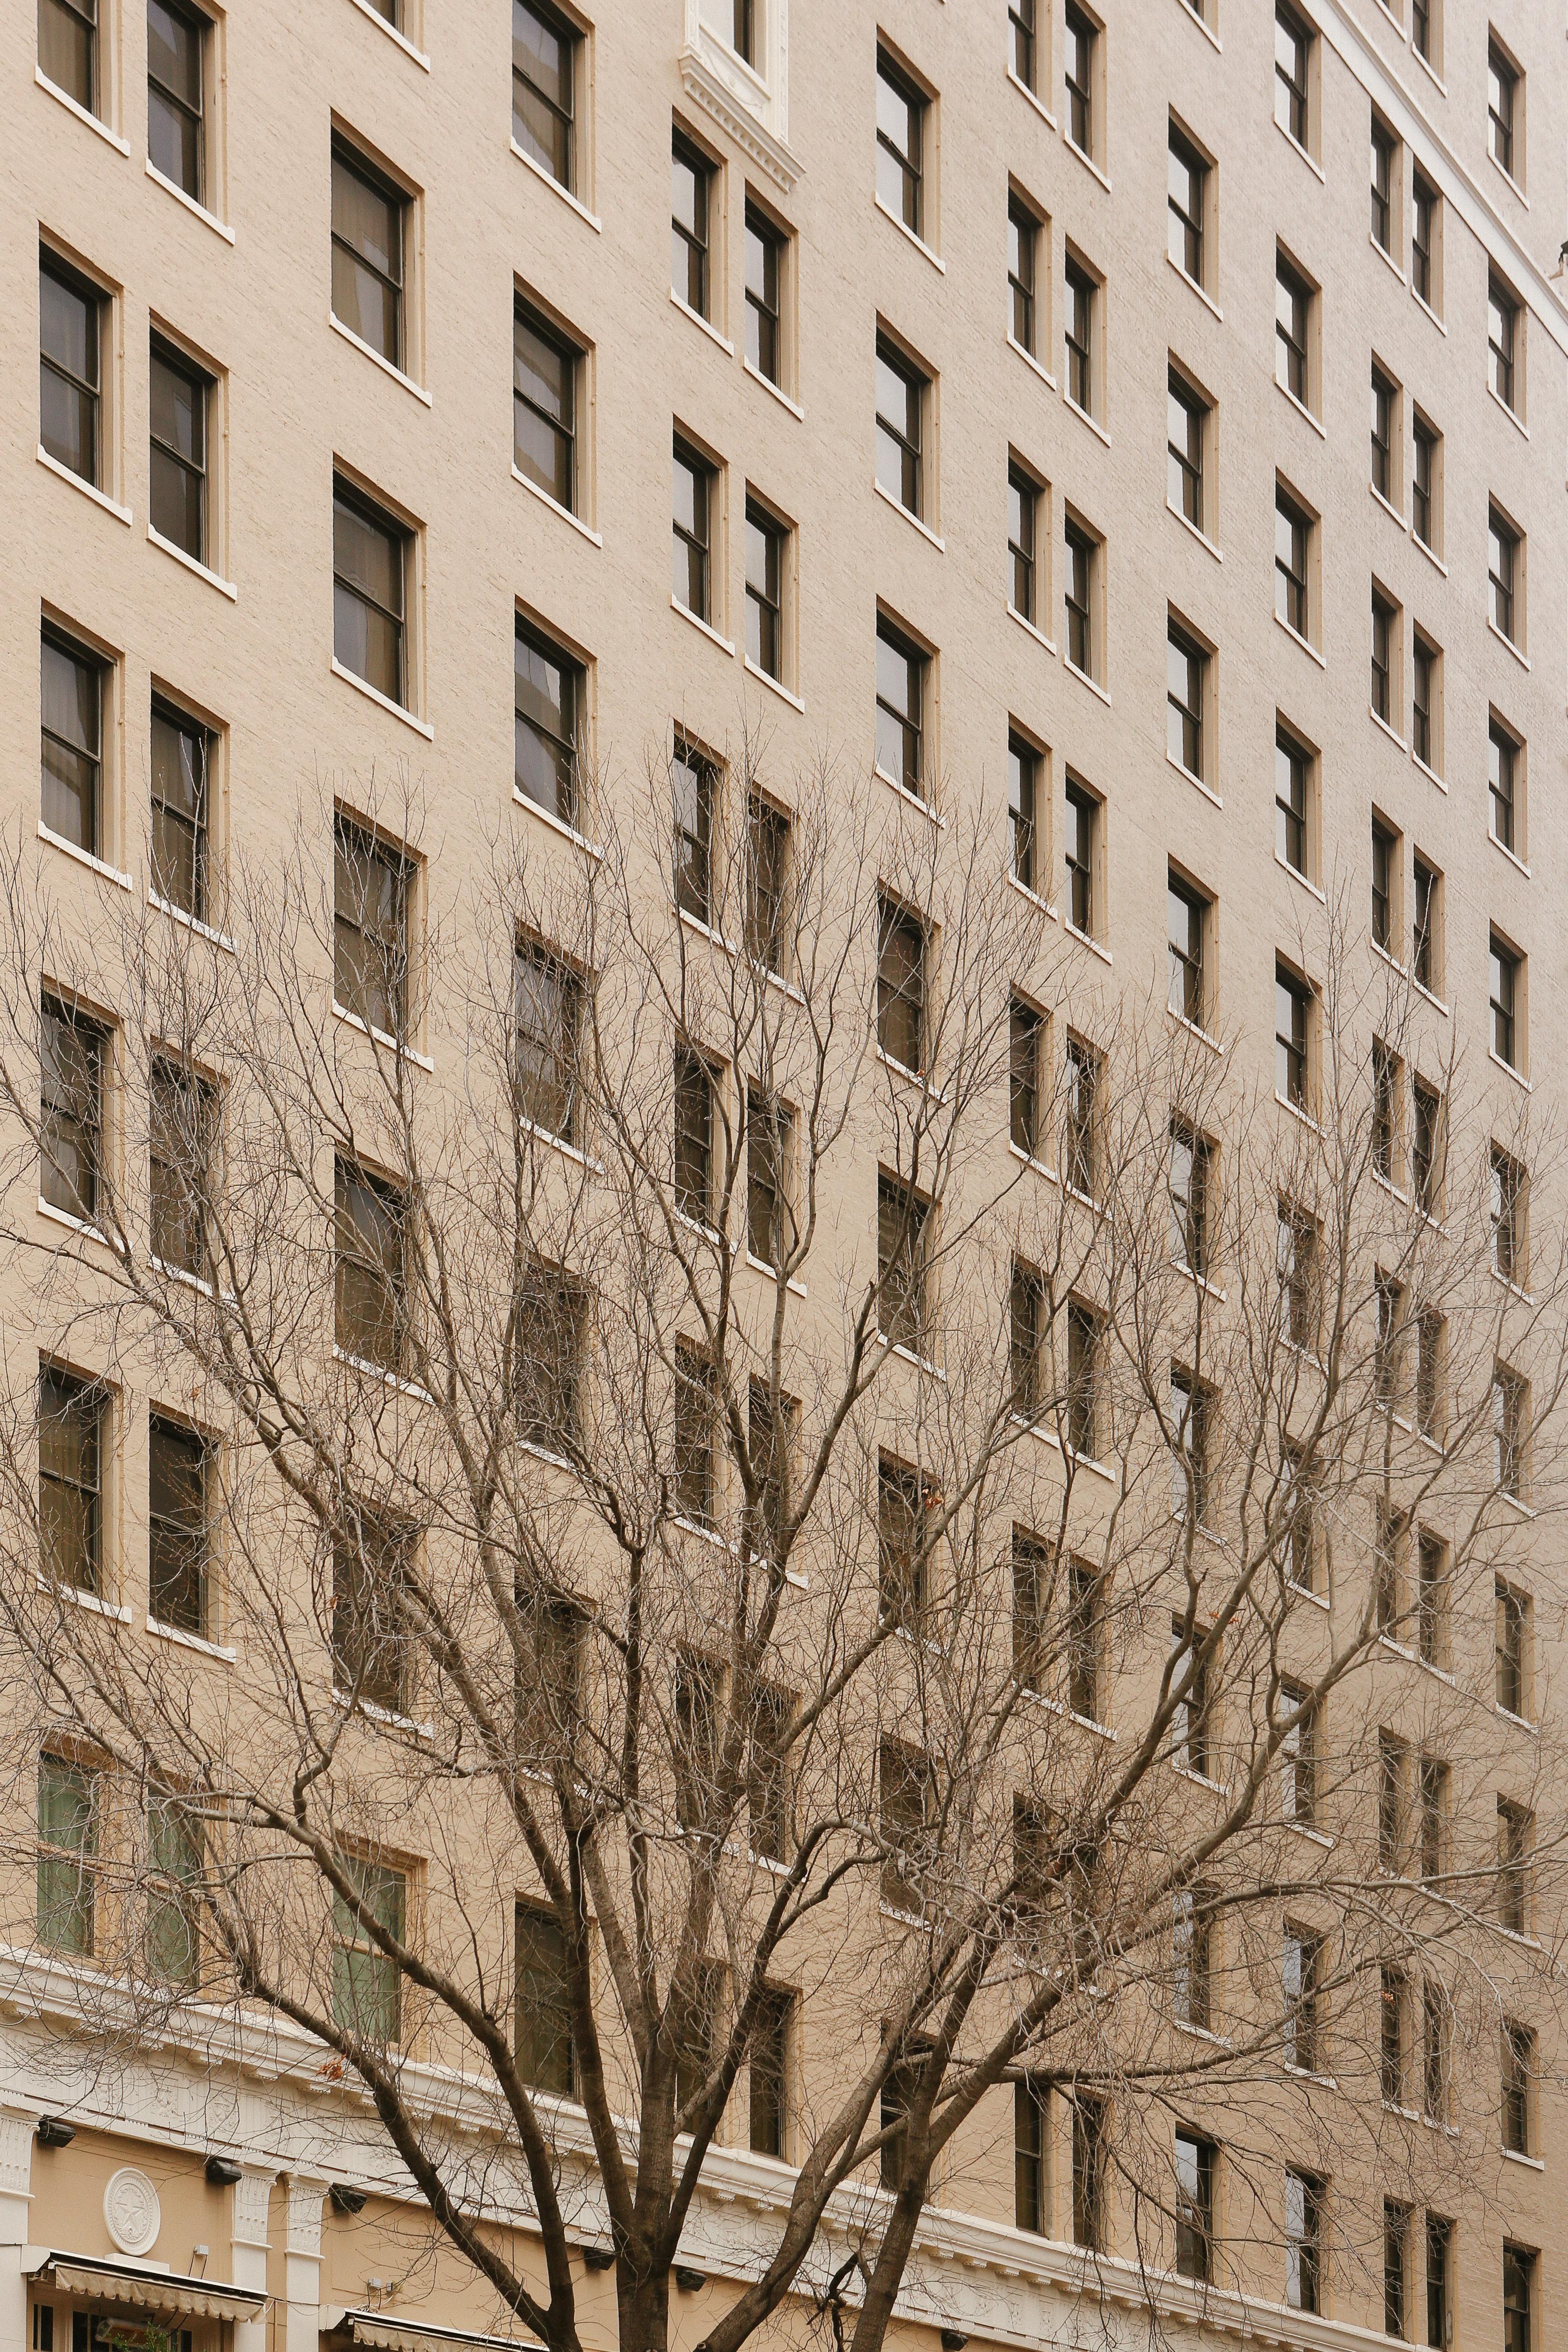 Austin Texas Building Facade With Tree